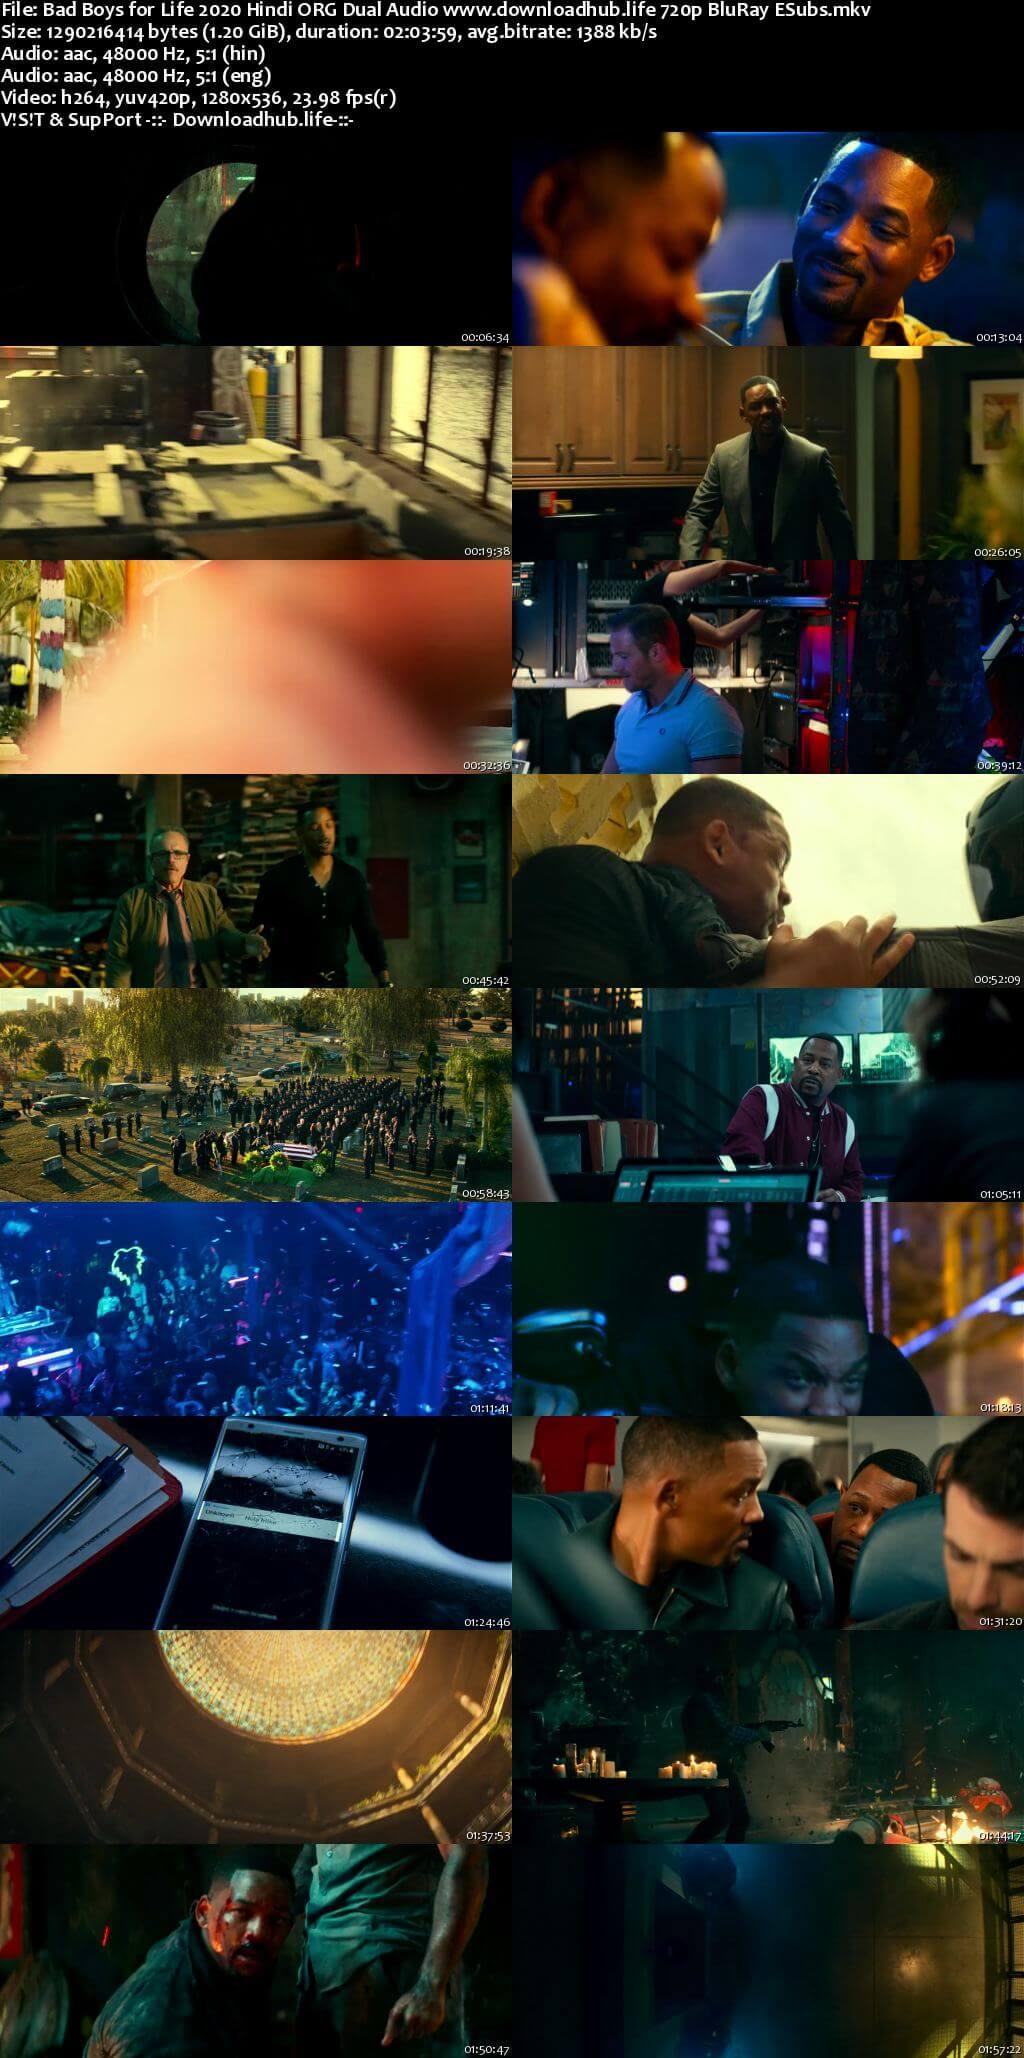 Bad Boys for Life 2020 Hindi ORG Dual Audio 720p BluRay ESubs